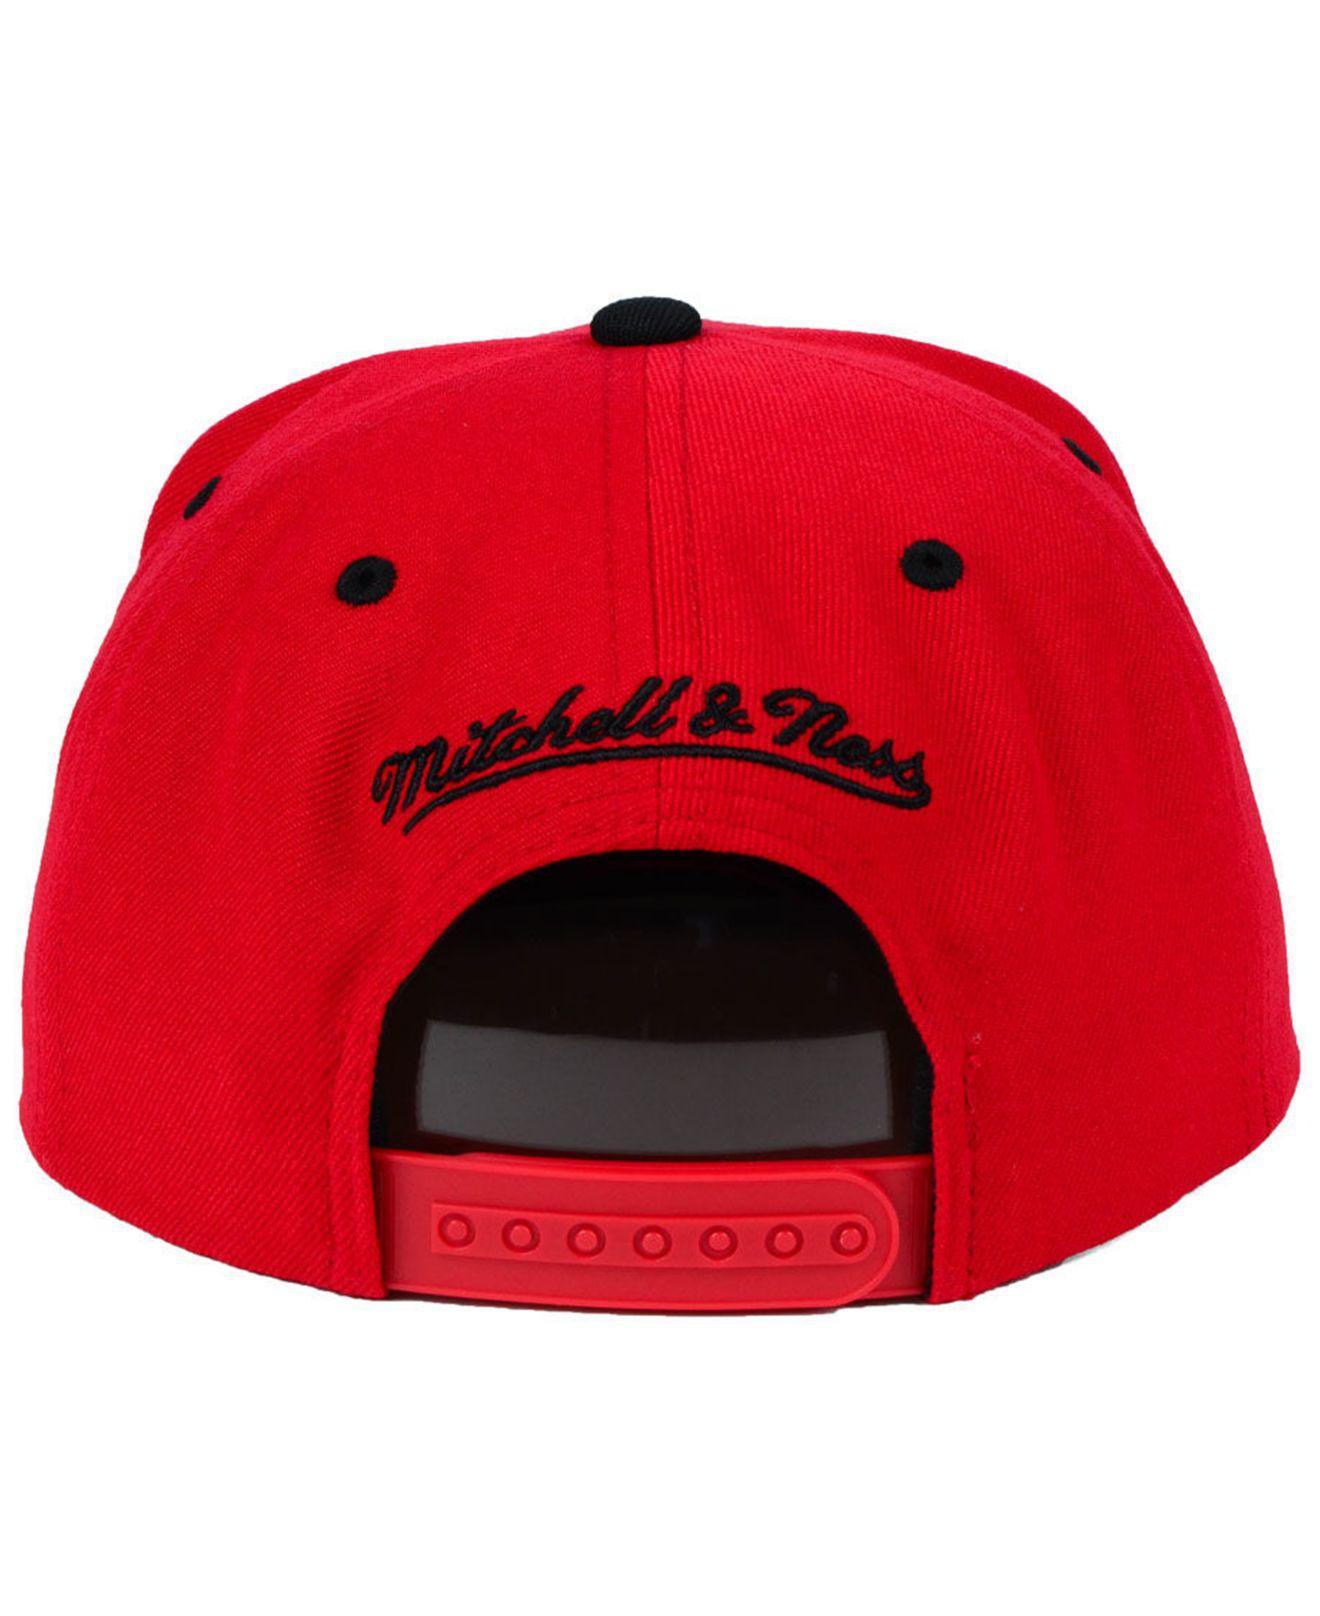 dbdf3344 Mitchell & Ness - Red Chicago Bulls Black & Gold Metallic Snapback Cap for  Men -. View fullscreen